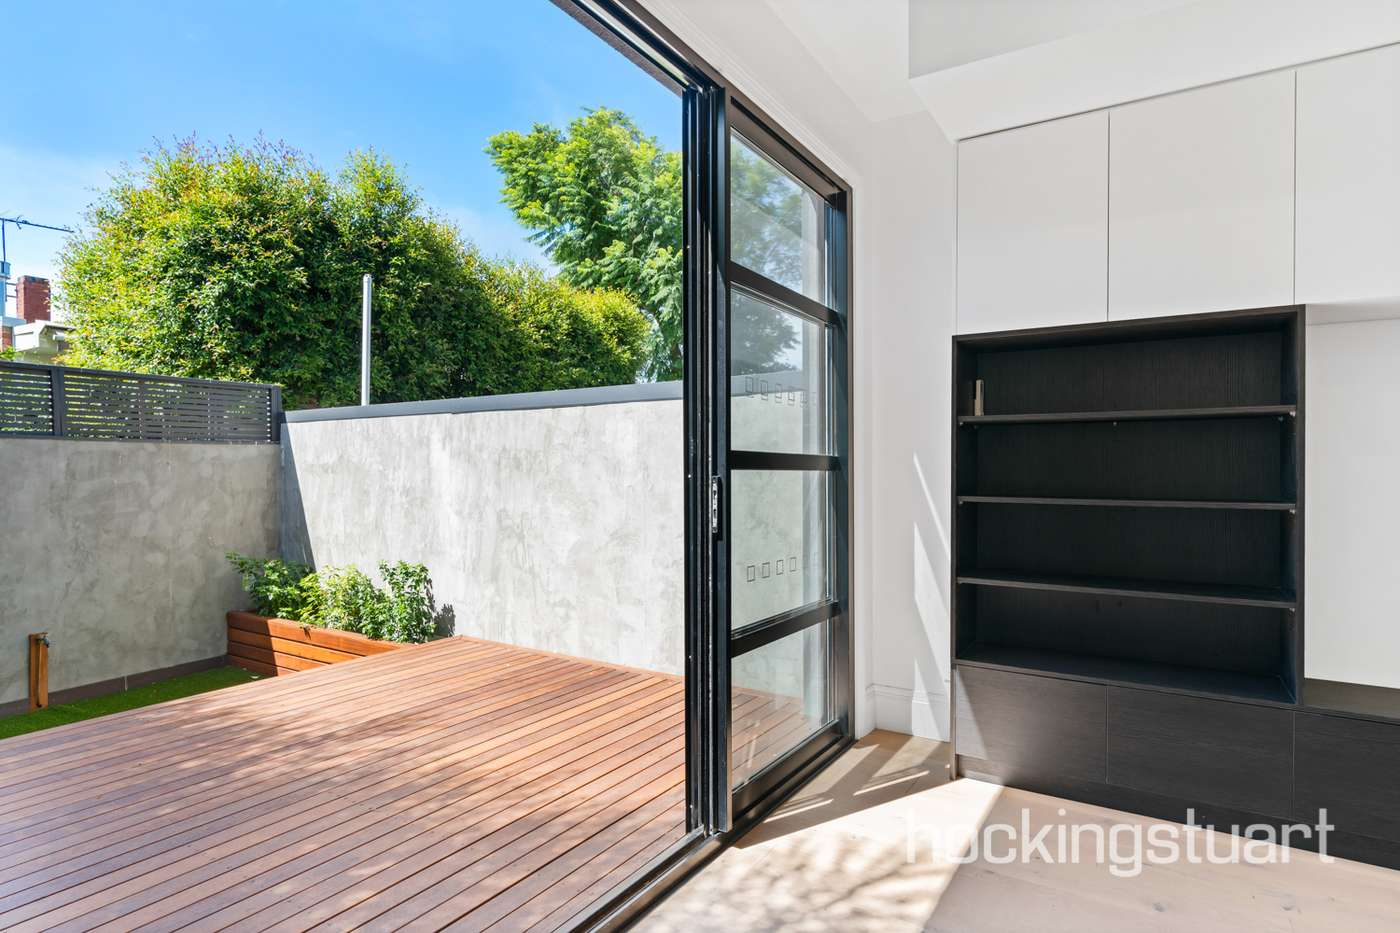 Main view of Homely house listing, 133 Danks Street, Albert Park, VIC 3206